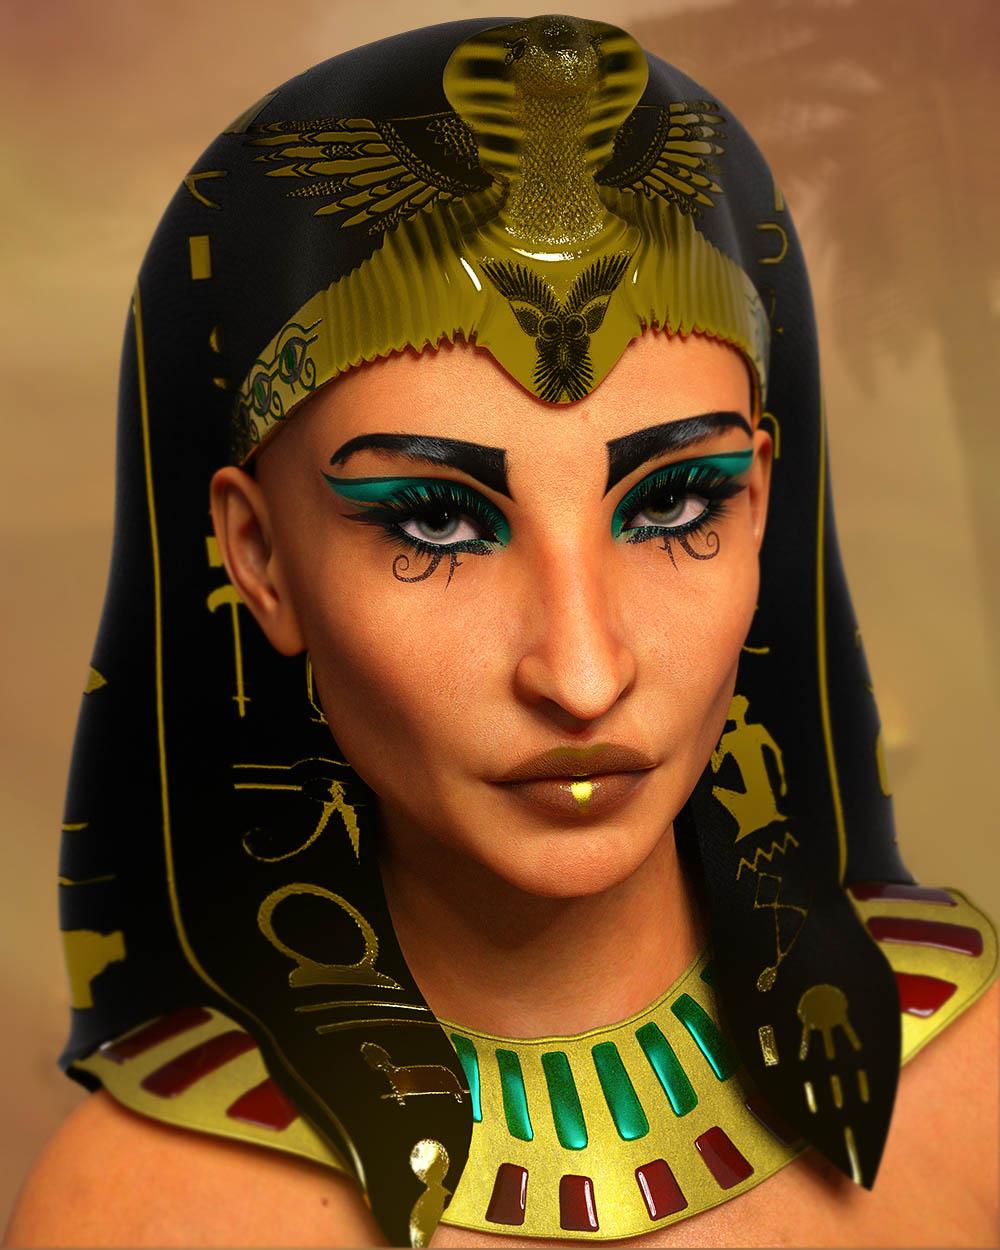 Nailah for Genesis 8 Female by: TwiztedMetal, 3D Models by Daz 3D